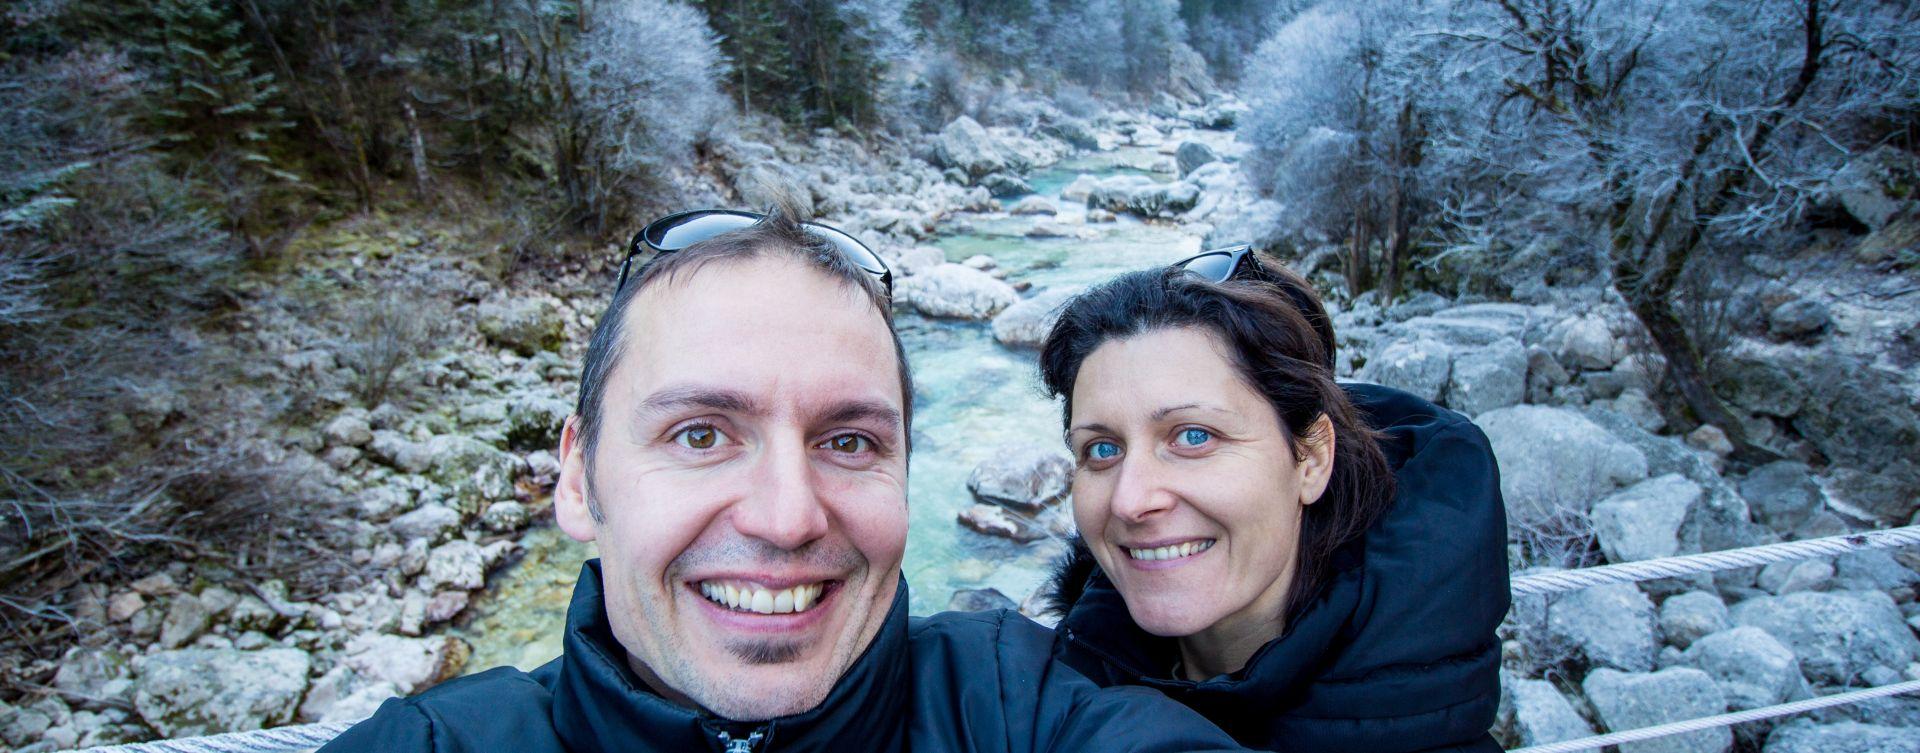 soca valley selfie